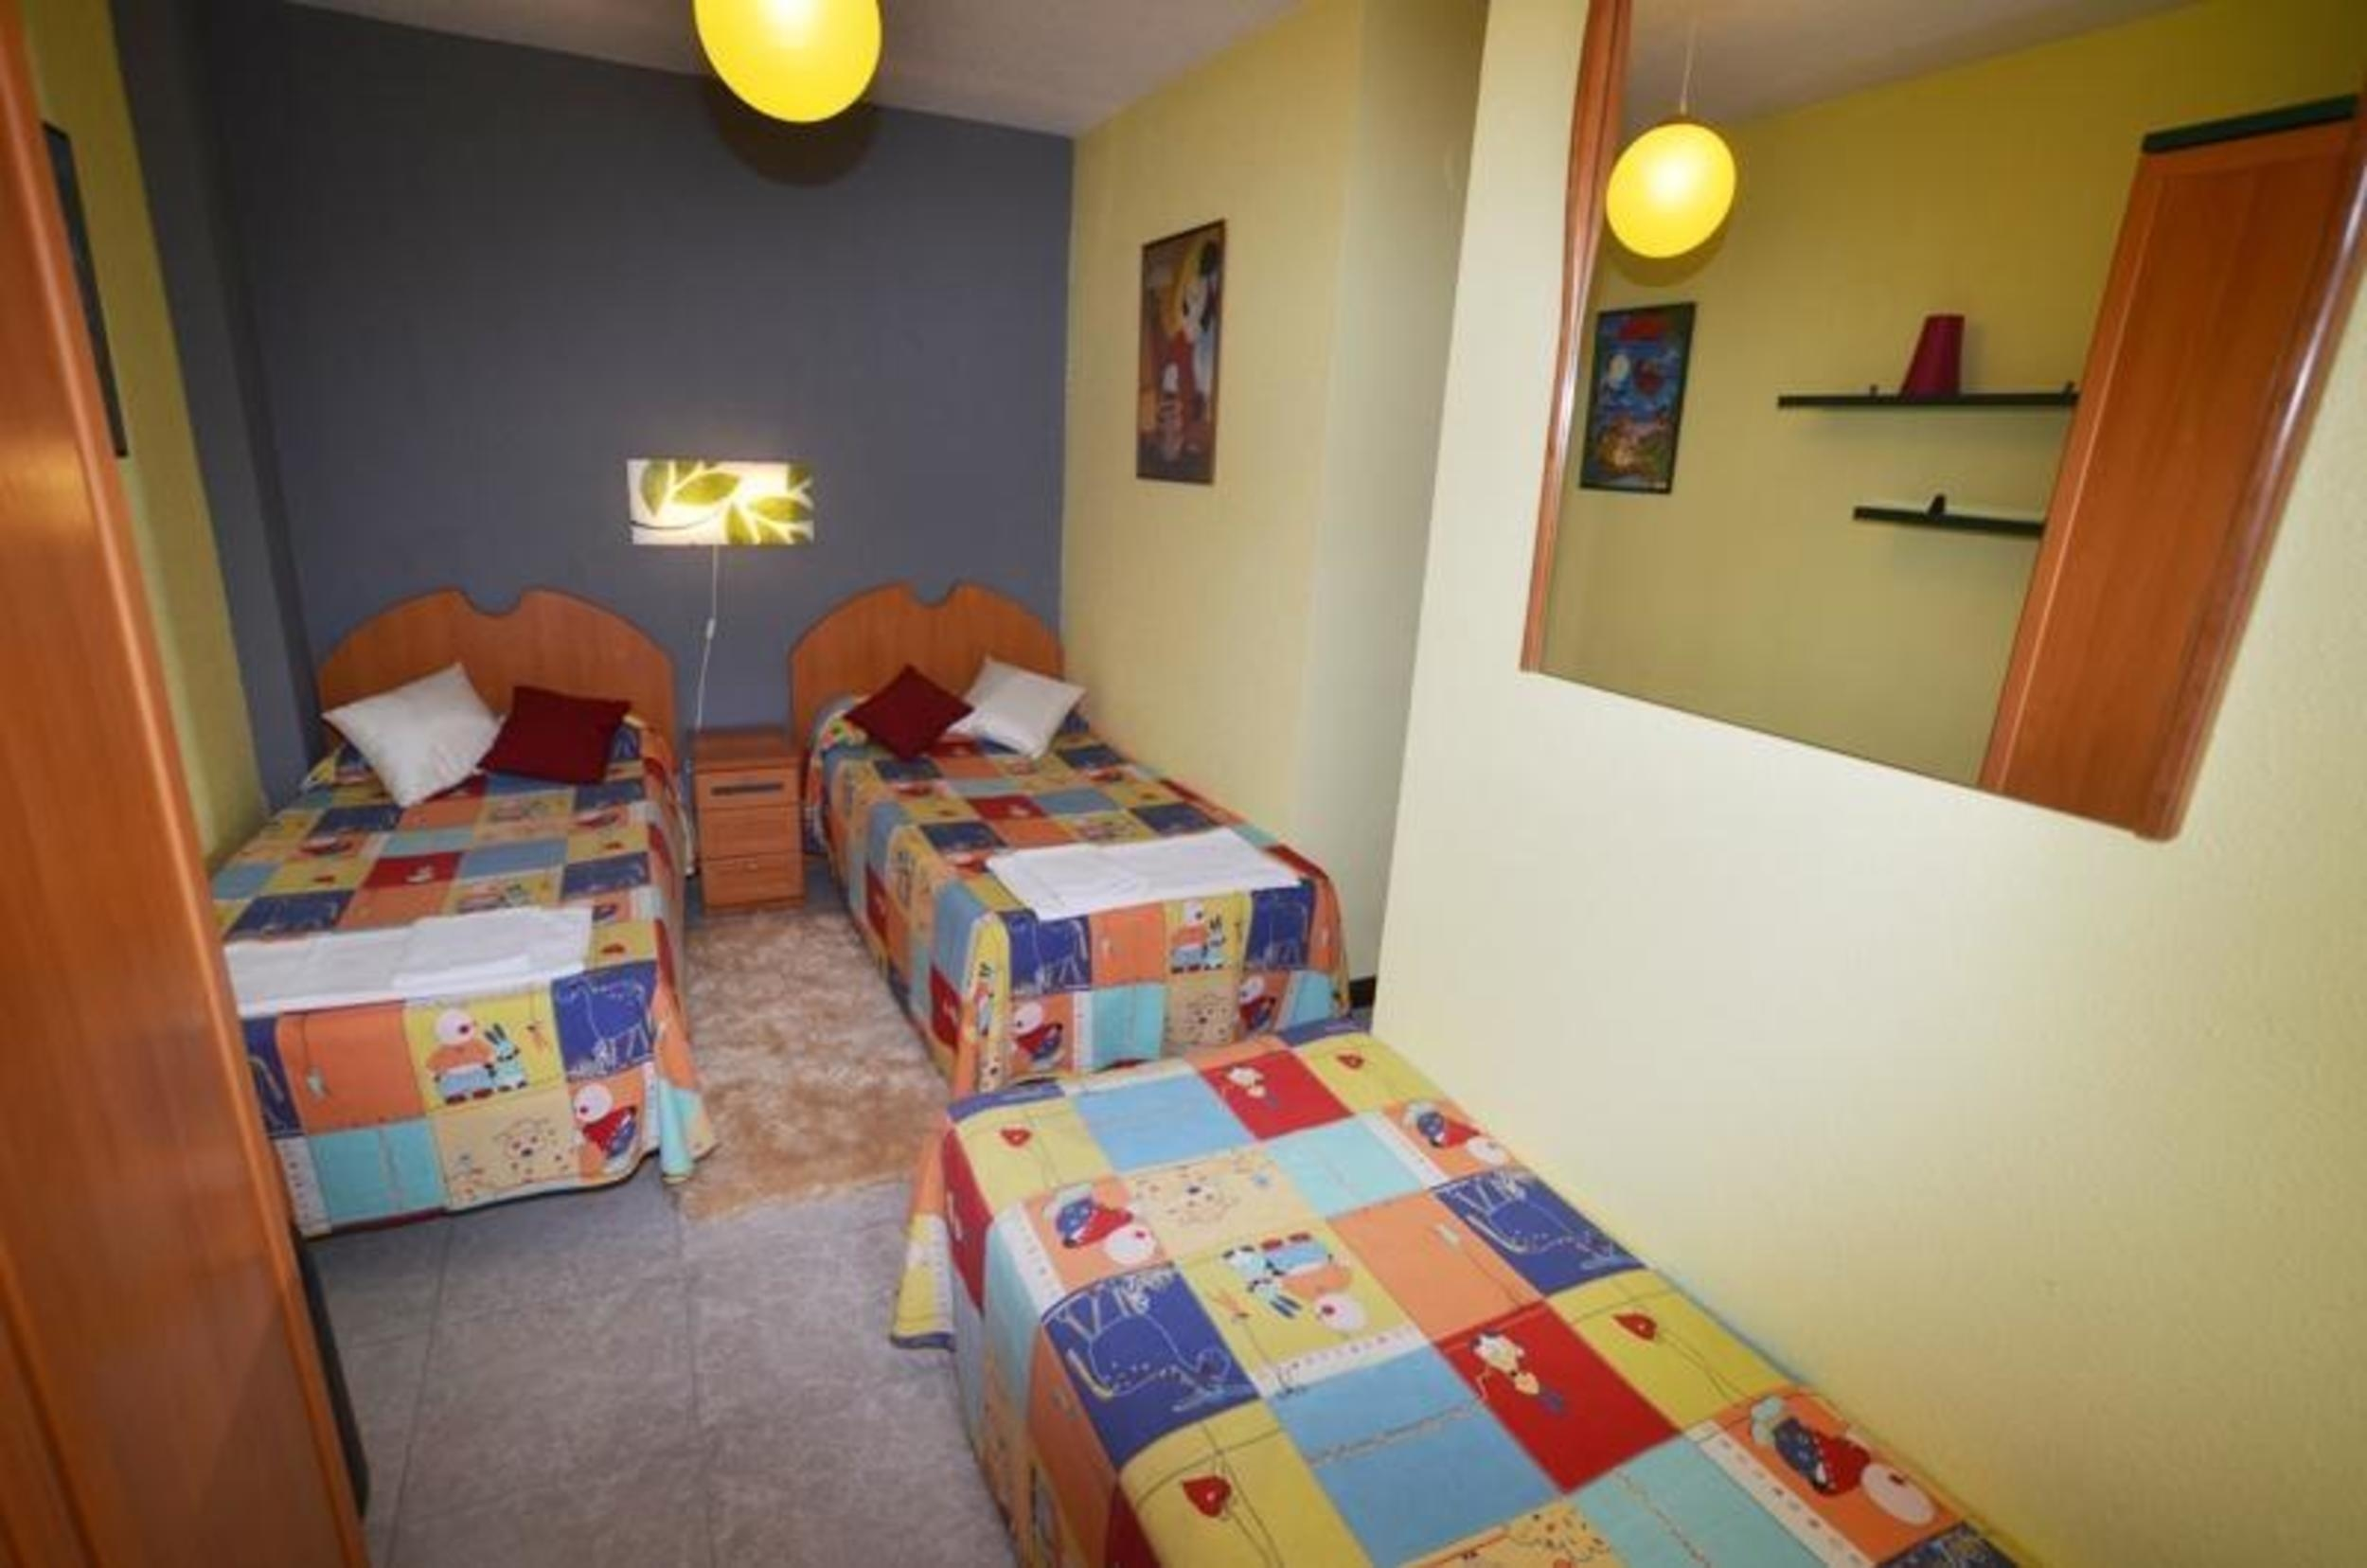 Ferienwohnung Apartment - 2 Bedrooms with Pool and Sea views - 102766 (2360874), Isla, Costa de Cantabria, Kantabrien, Spanien, Bild 8